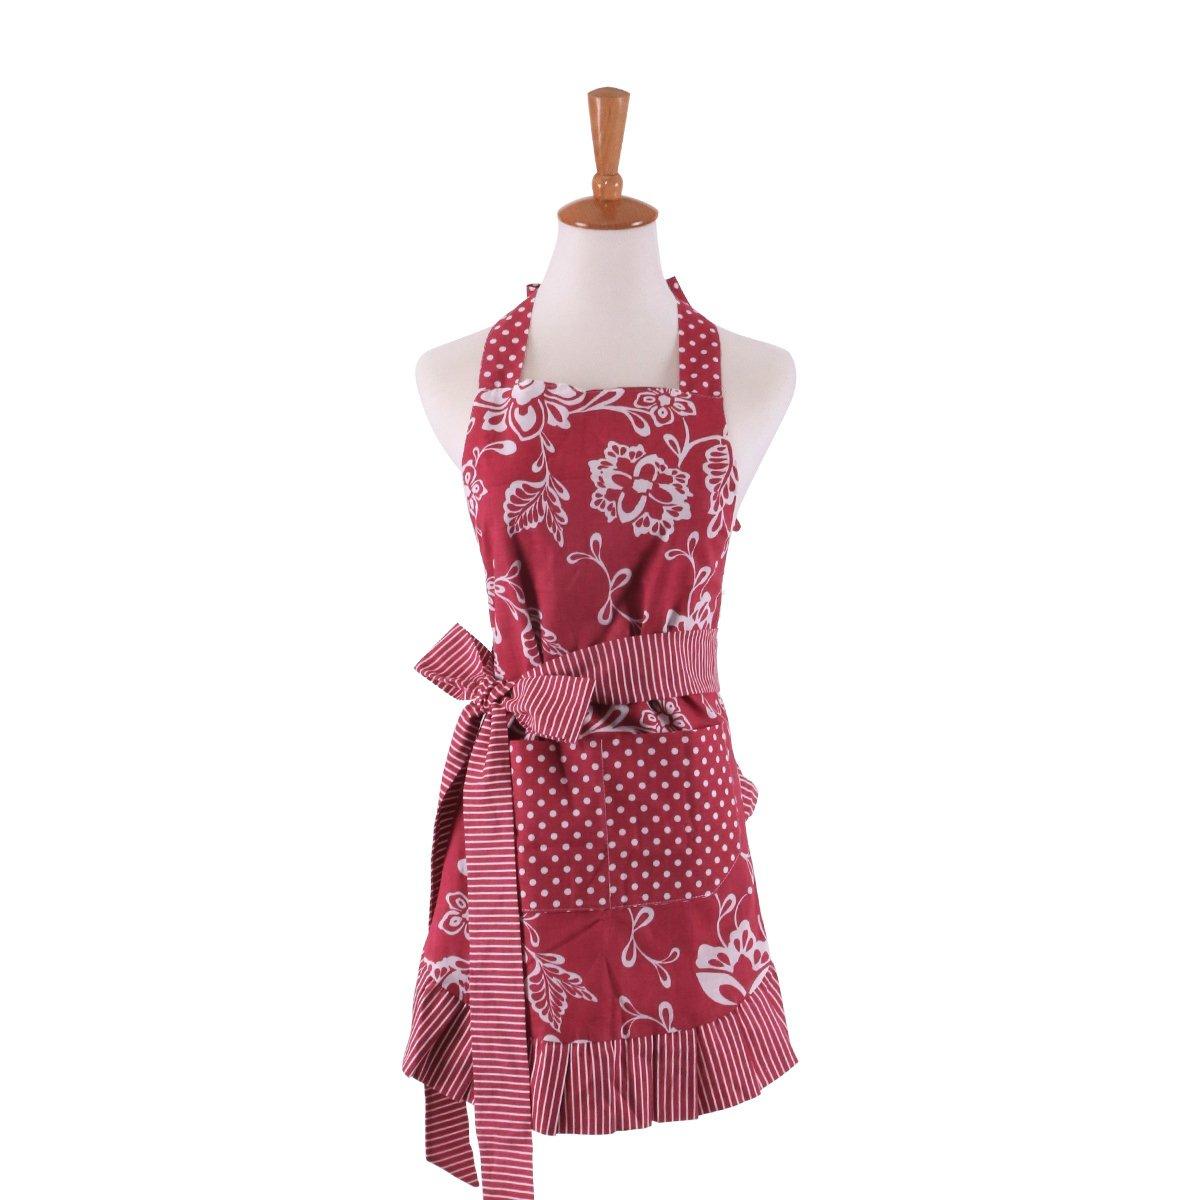 Abizoe Retro Vintage Women Cute Extra-long Tie Kitchen Adjustable Apron with Pocket for Home Shop Kitchen Baking Cooking Gardening (blue)